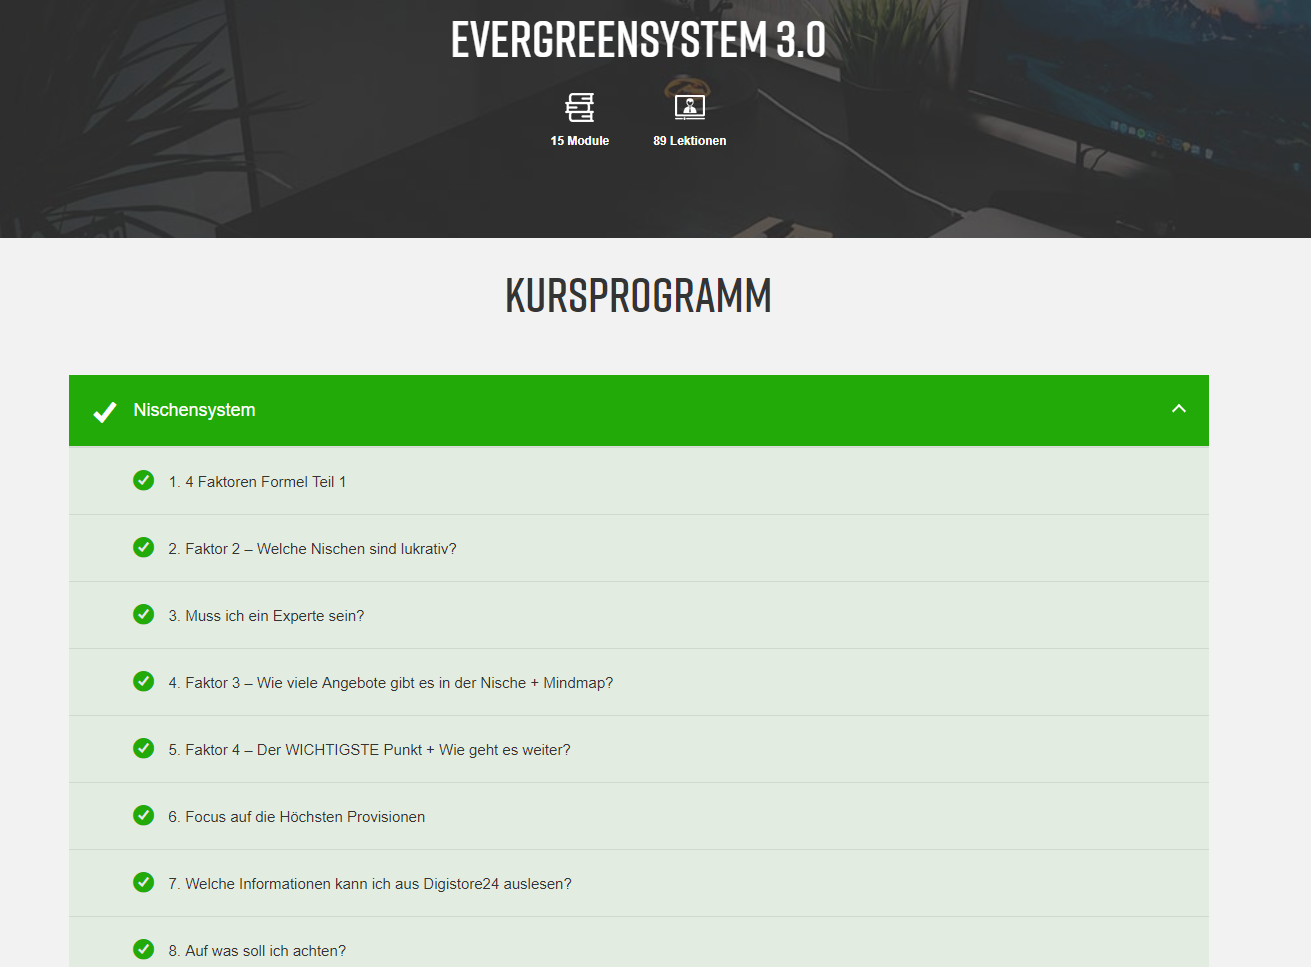 Evergreensystem von Said Shiripour